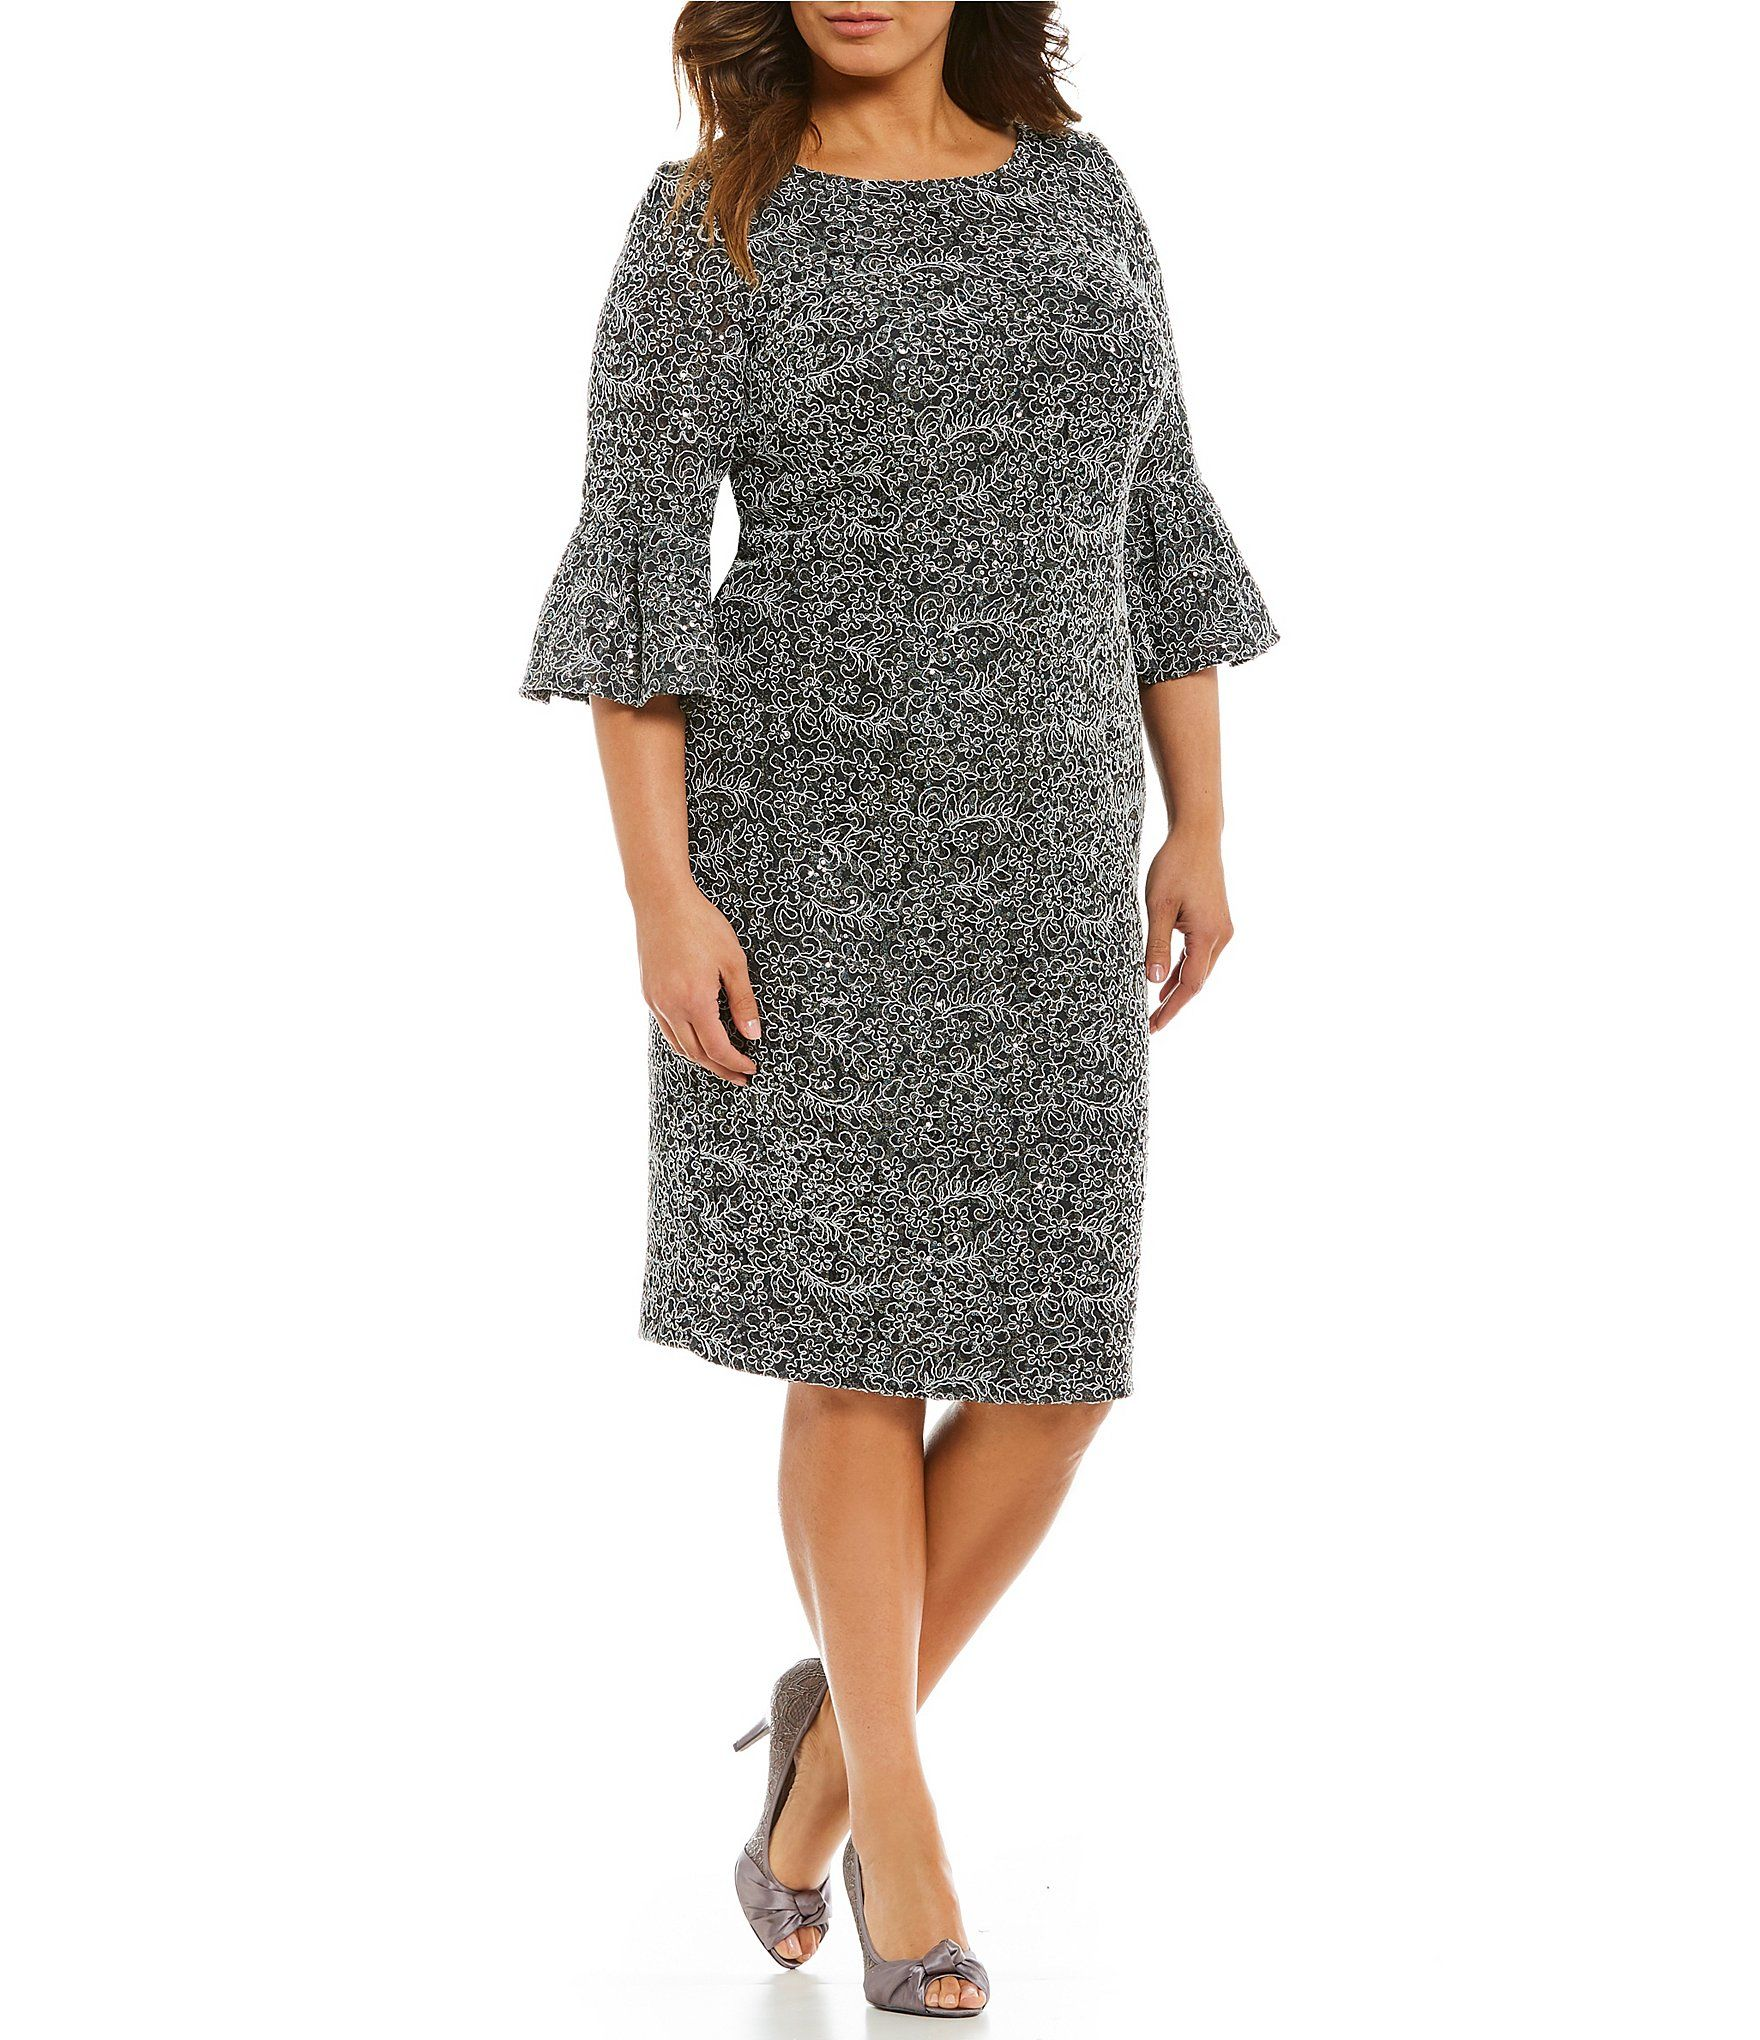 b1b3cd07d74 Alex Evenings Plus Corded Lace Bell Sleeve Dress  Dillards